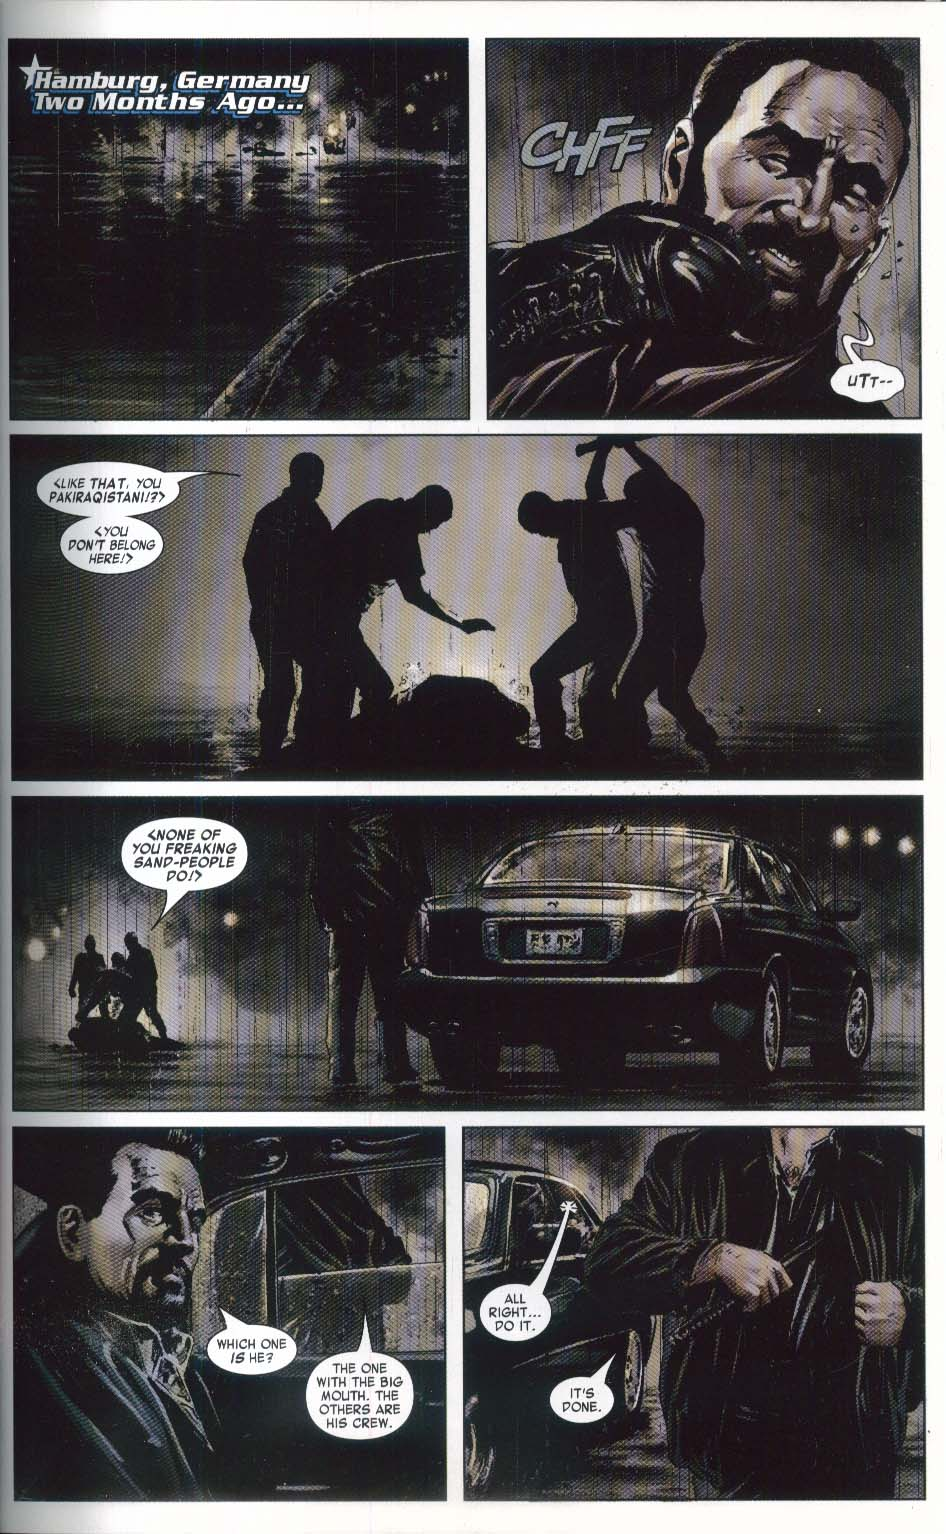 CAPTAIN AMERICA Red Menace Vol 2 Marvel Graphic Novel 1st Printing 2006